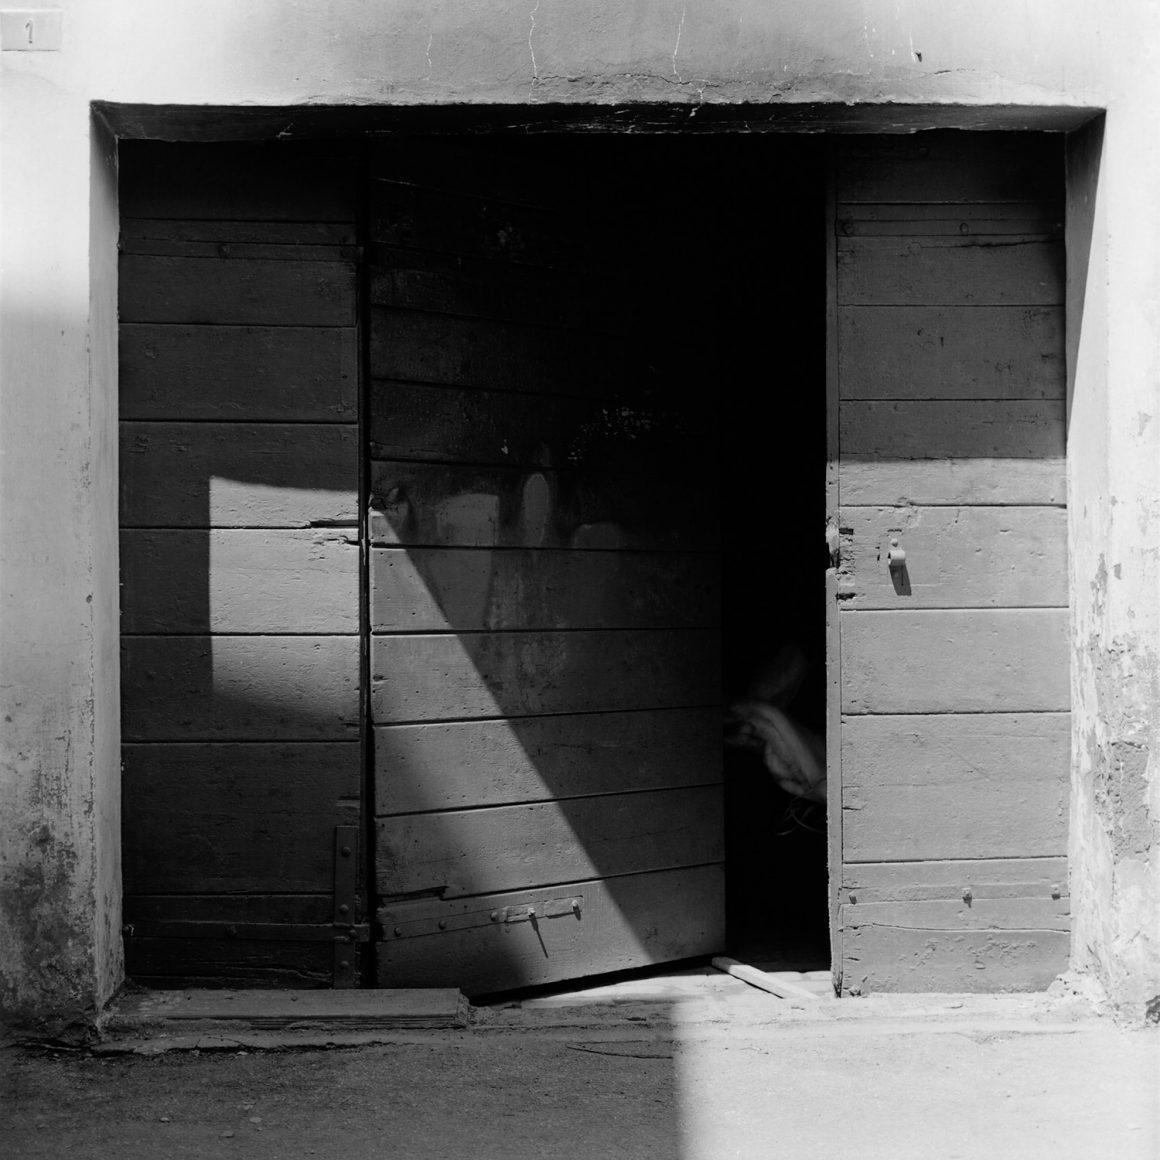 Guido Guidi, Via Montanari, Cesena, 1980, stampa ai sali d'argento, cm 24x30, © Guido Guidi, courtesy Viasaterna